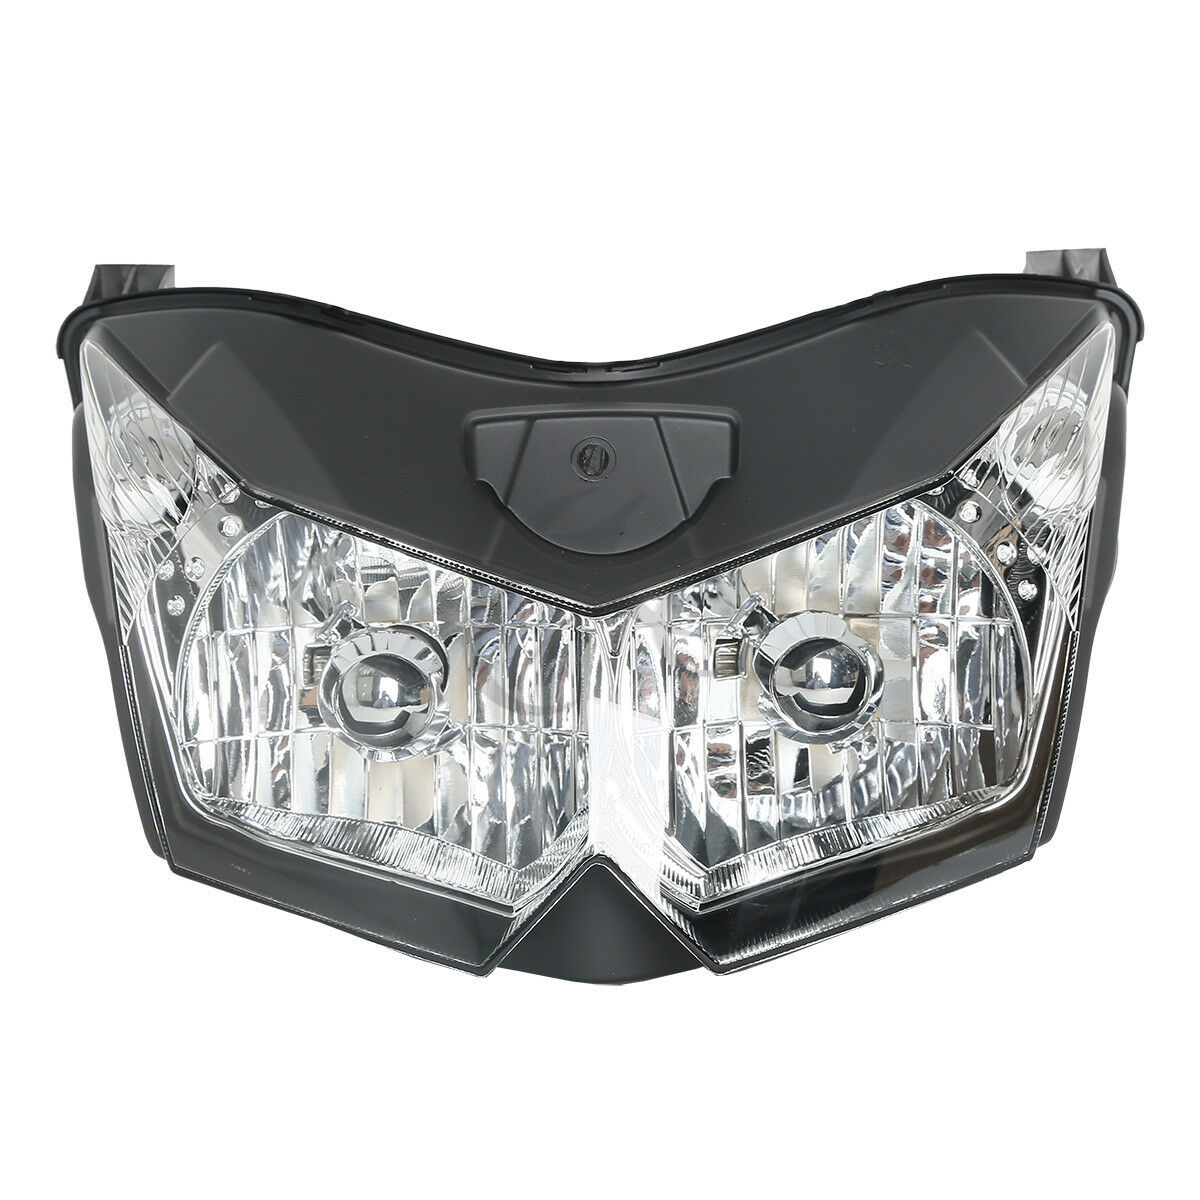 ABS واضح المصباح مصباح الجمعية صالح لكاواساكي ZRT00B Z750 ZR750L 2007-2009